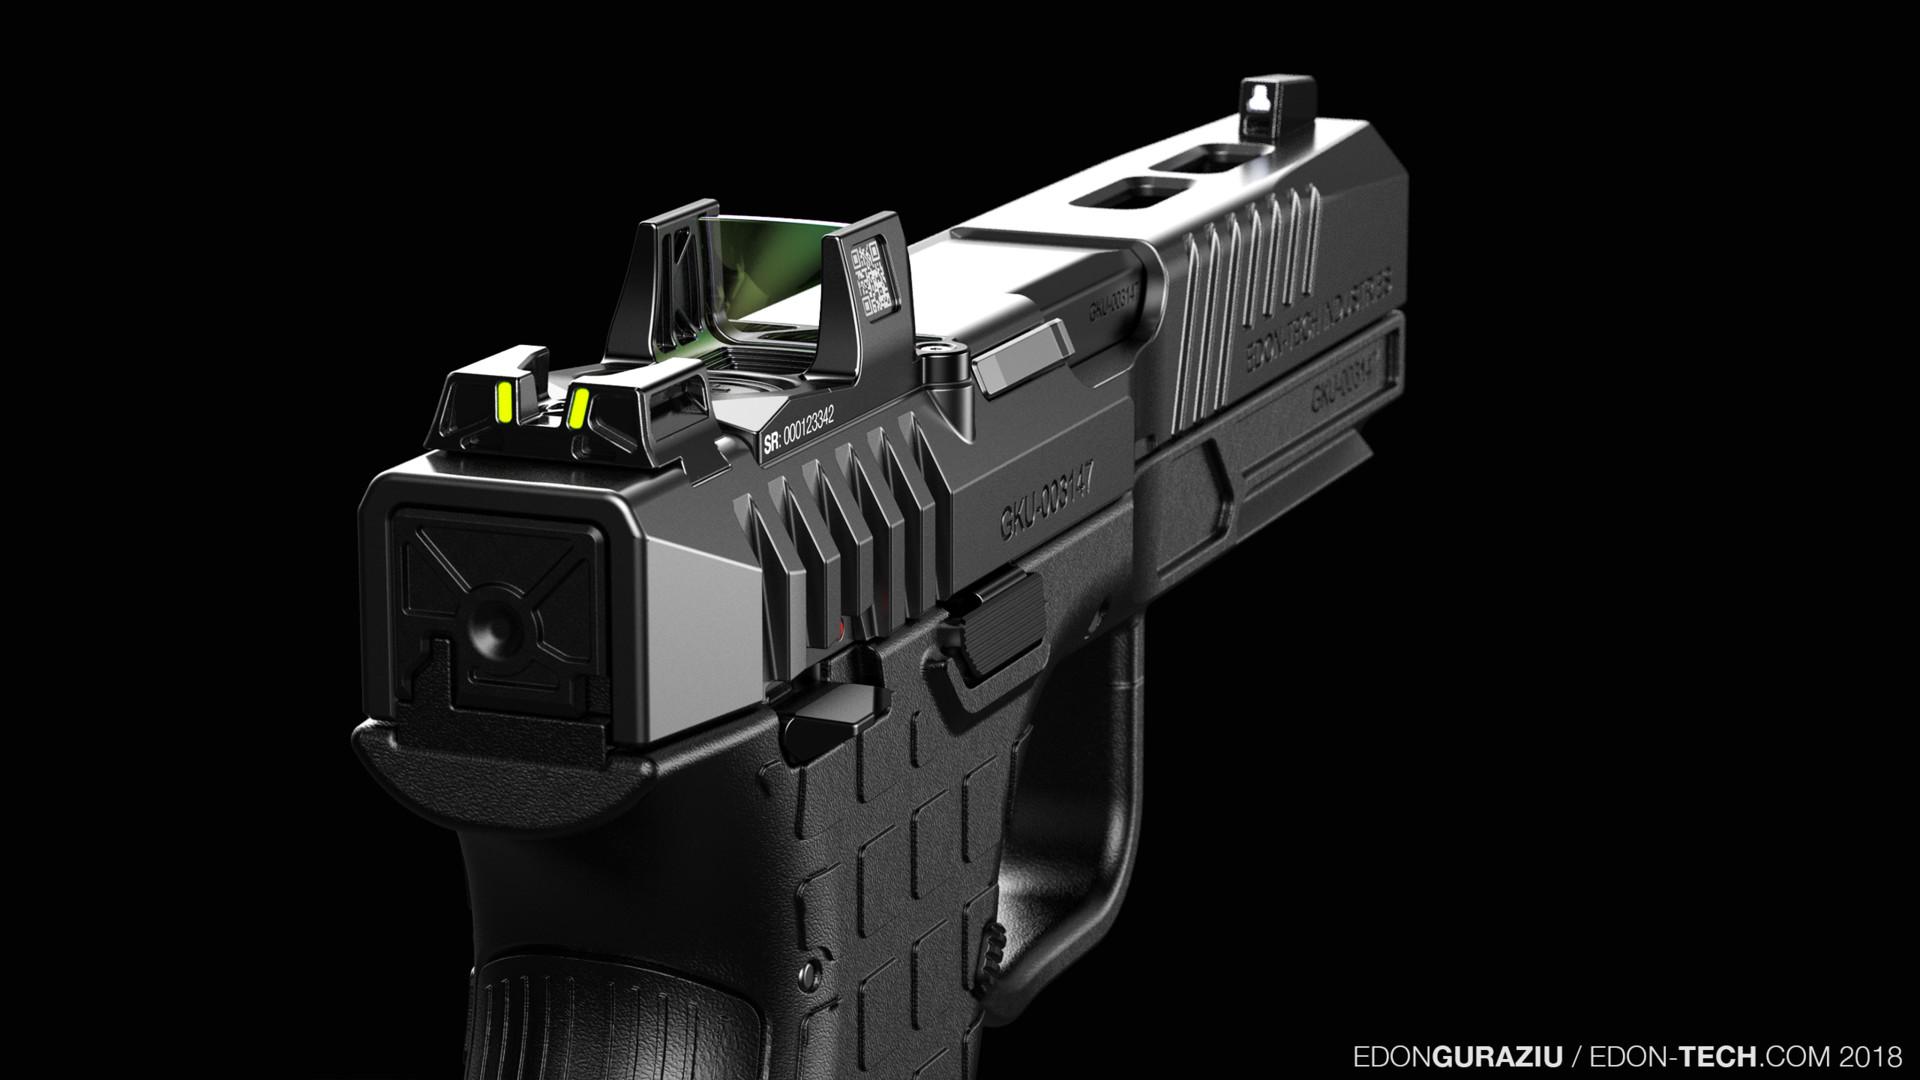 Edon guraziu nra pistol image 002